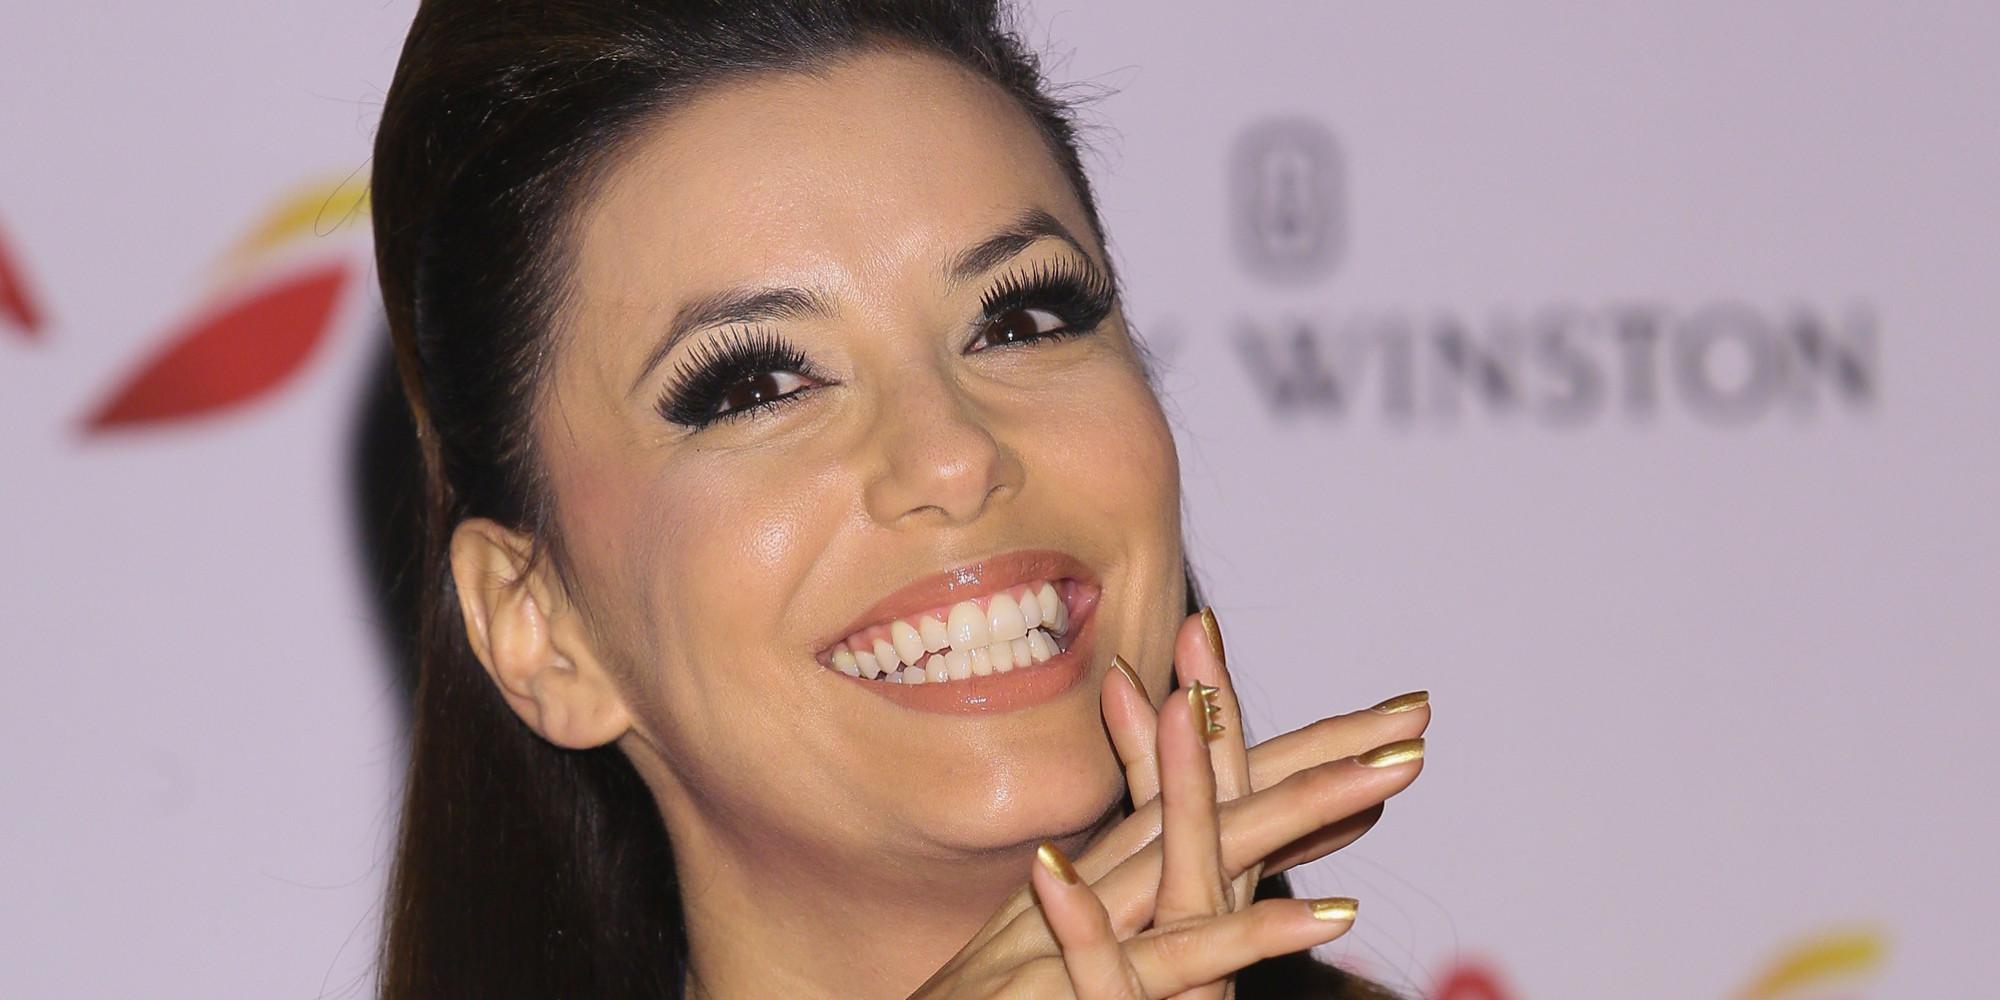 Eva Longoria No Makeup Eva longoria doesnu0026#39;t look like